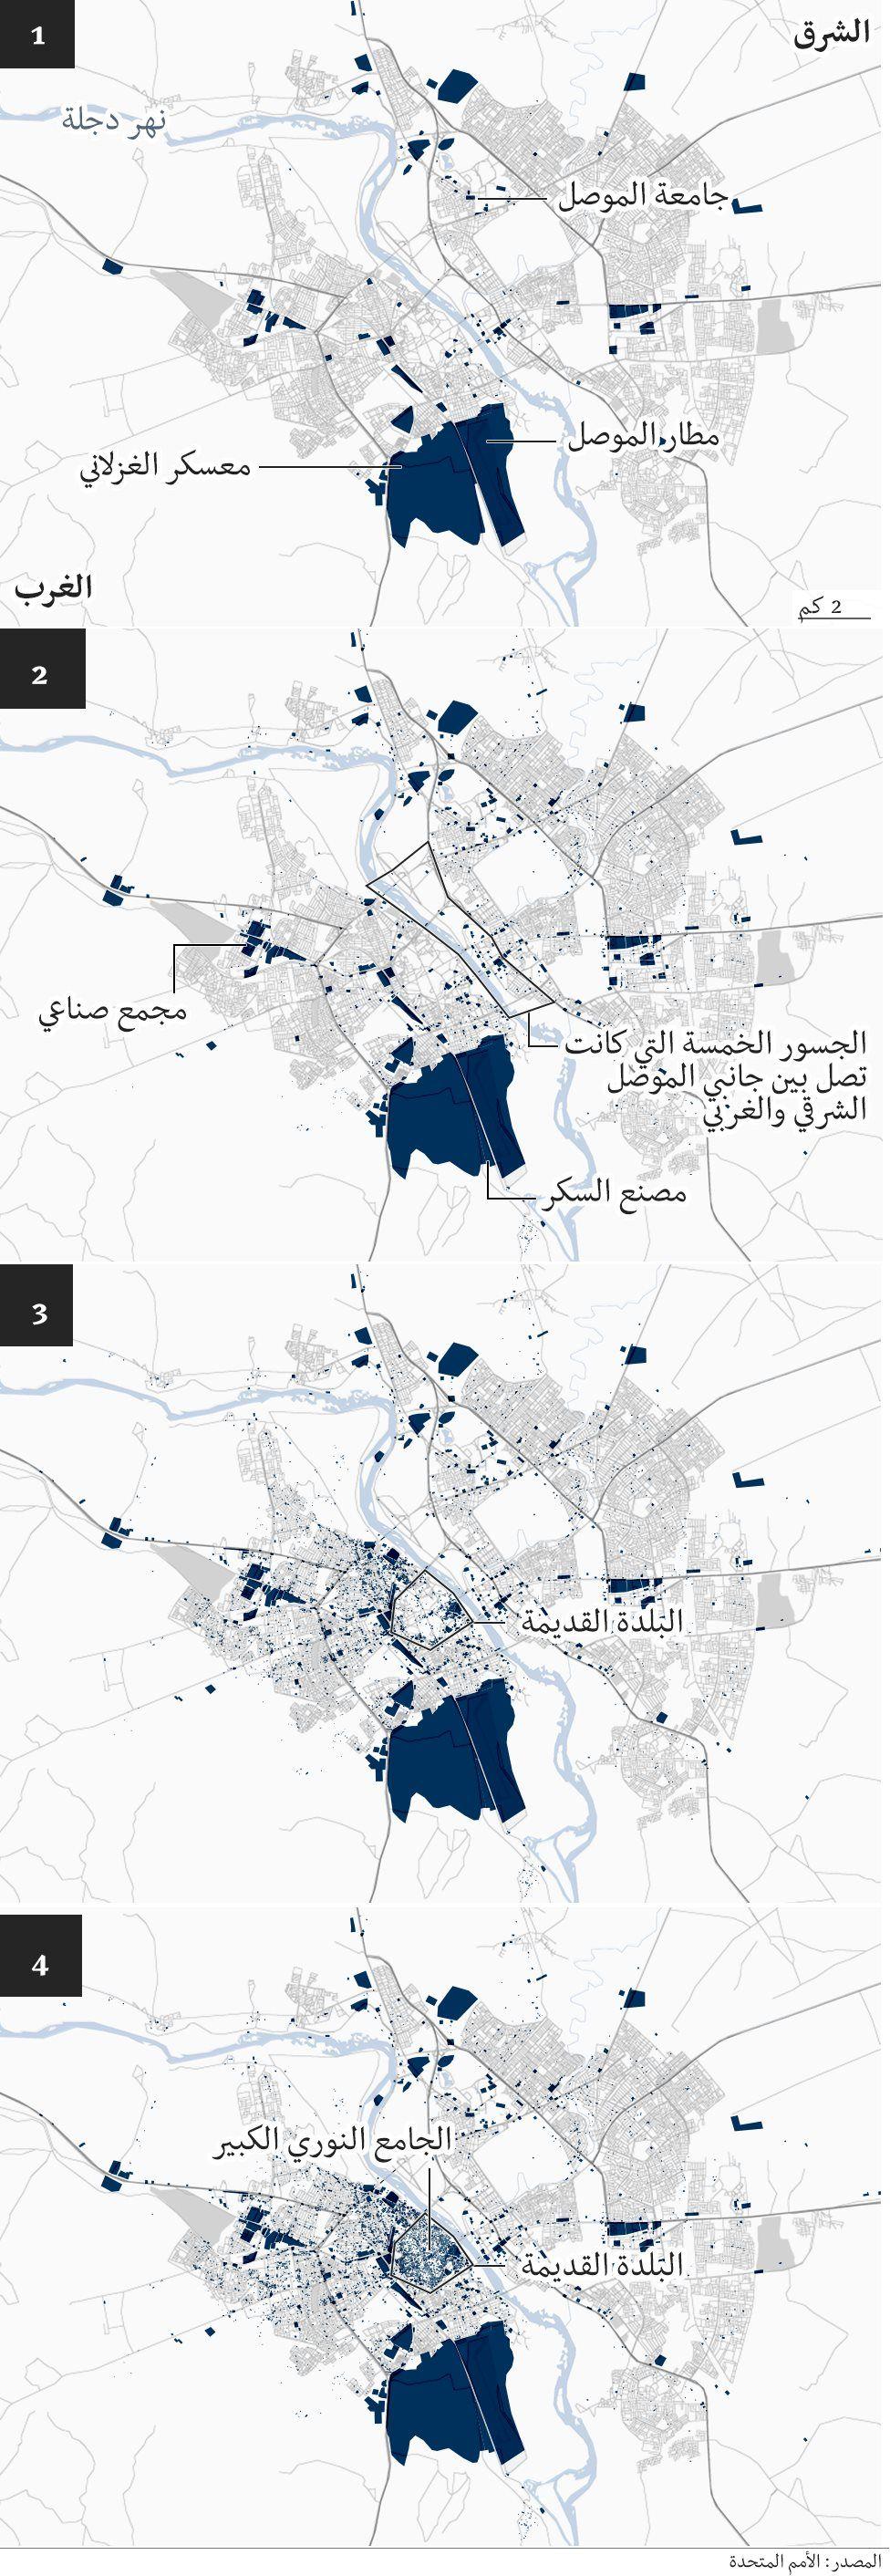 معركة الموصل - صفحة 15 _97281210_c8e37e73-b979-40f9-965d-b857e42bc0b2